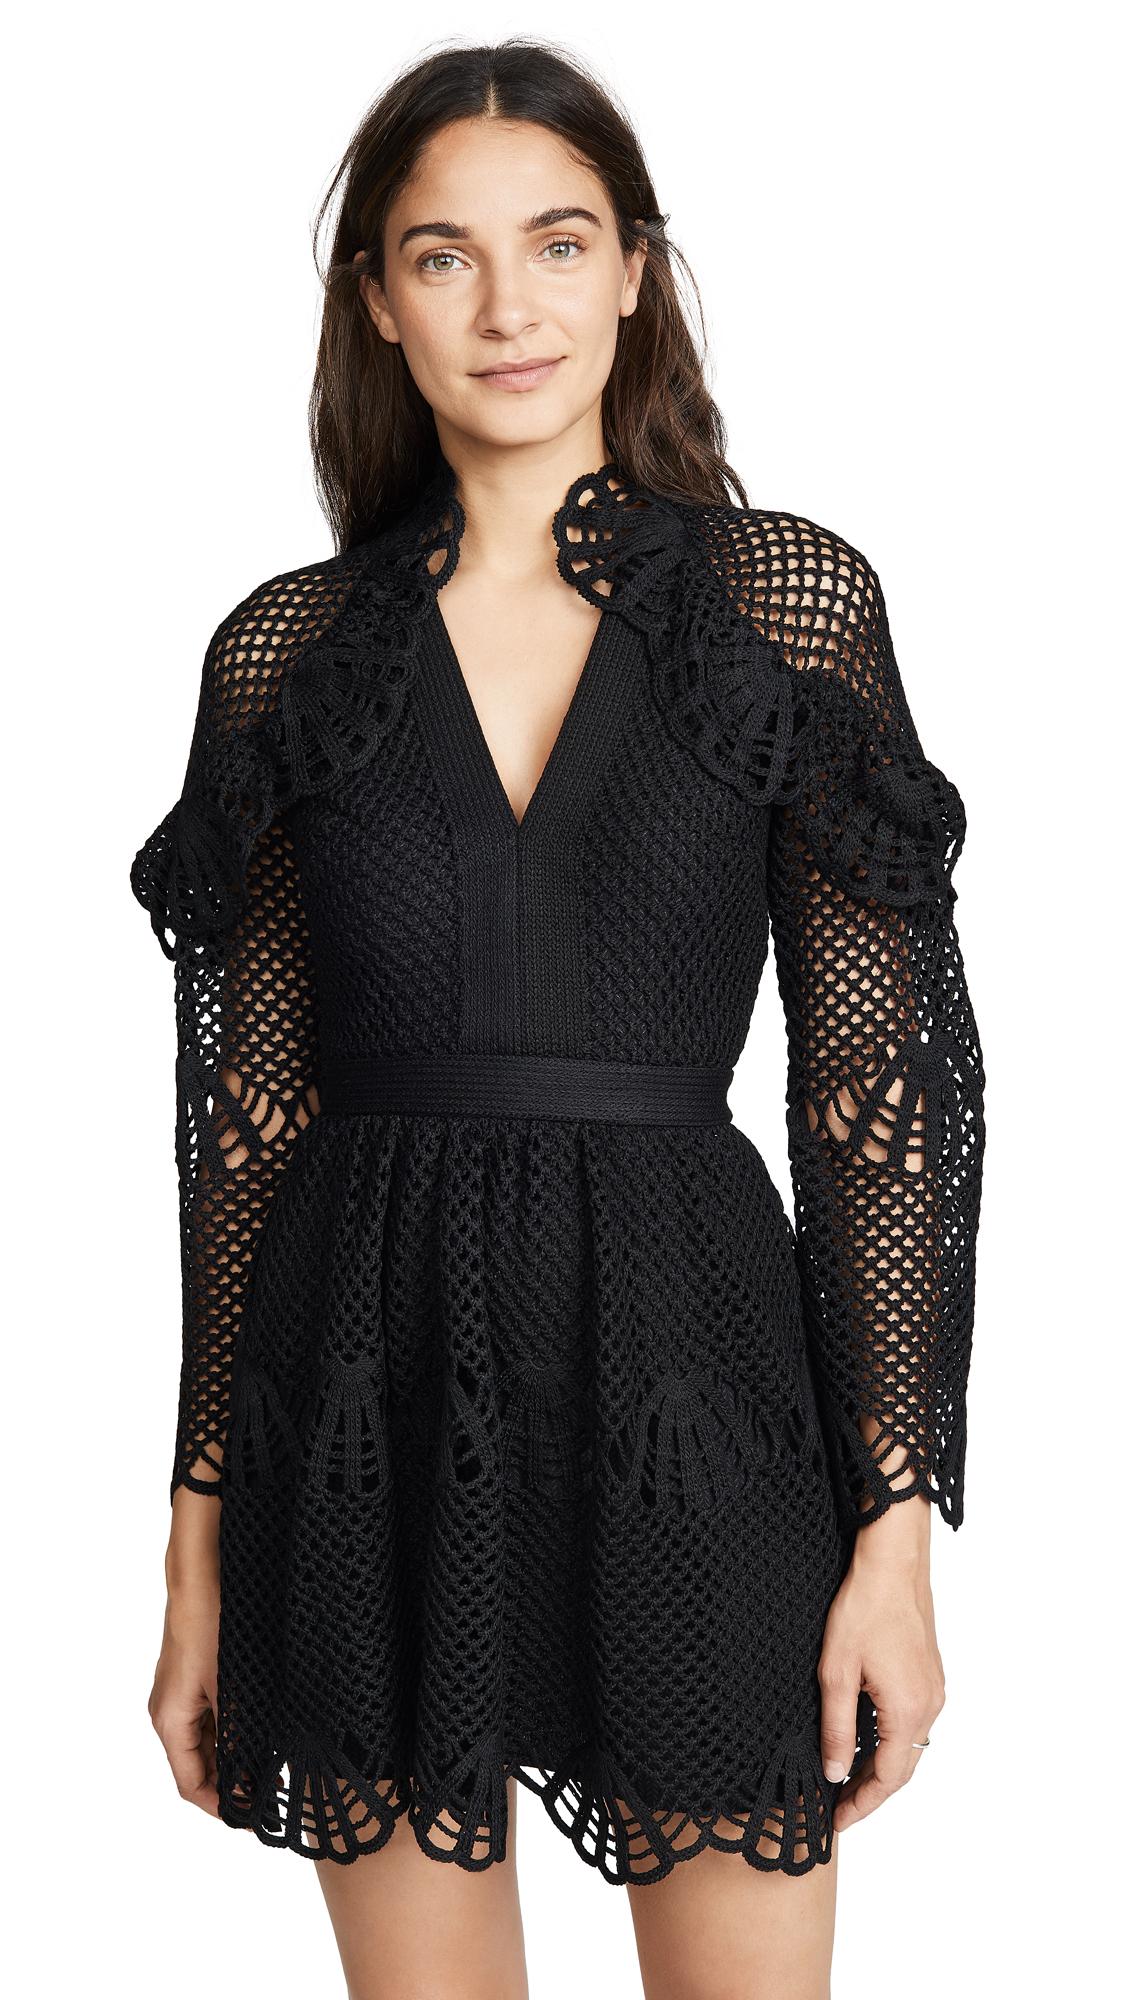 Self Portrait Crochet Mini Dress - Black